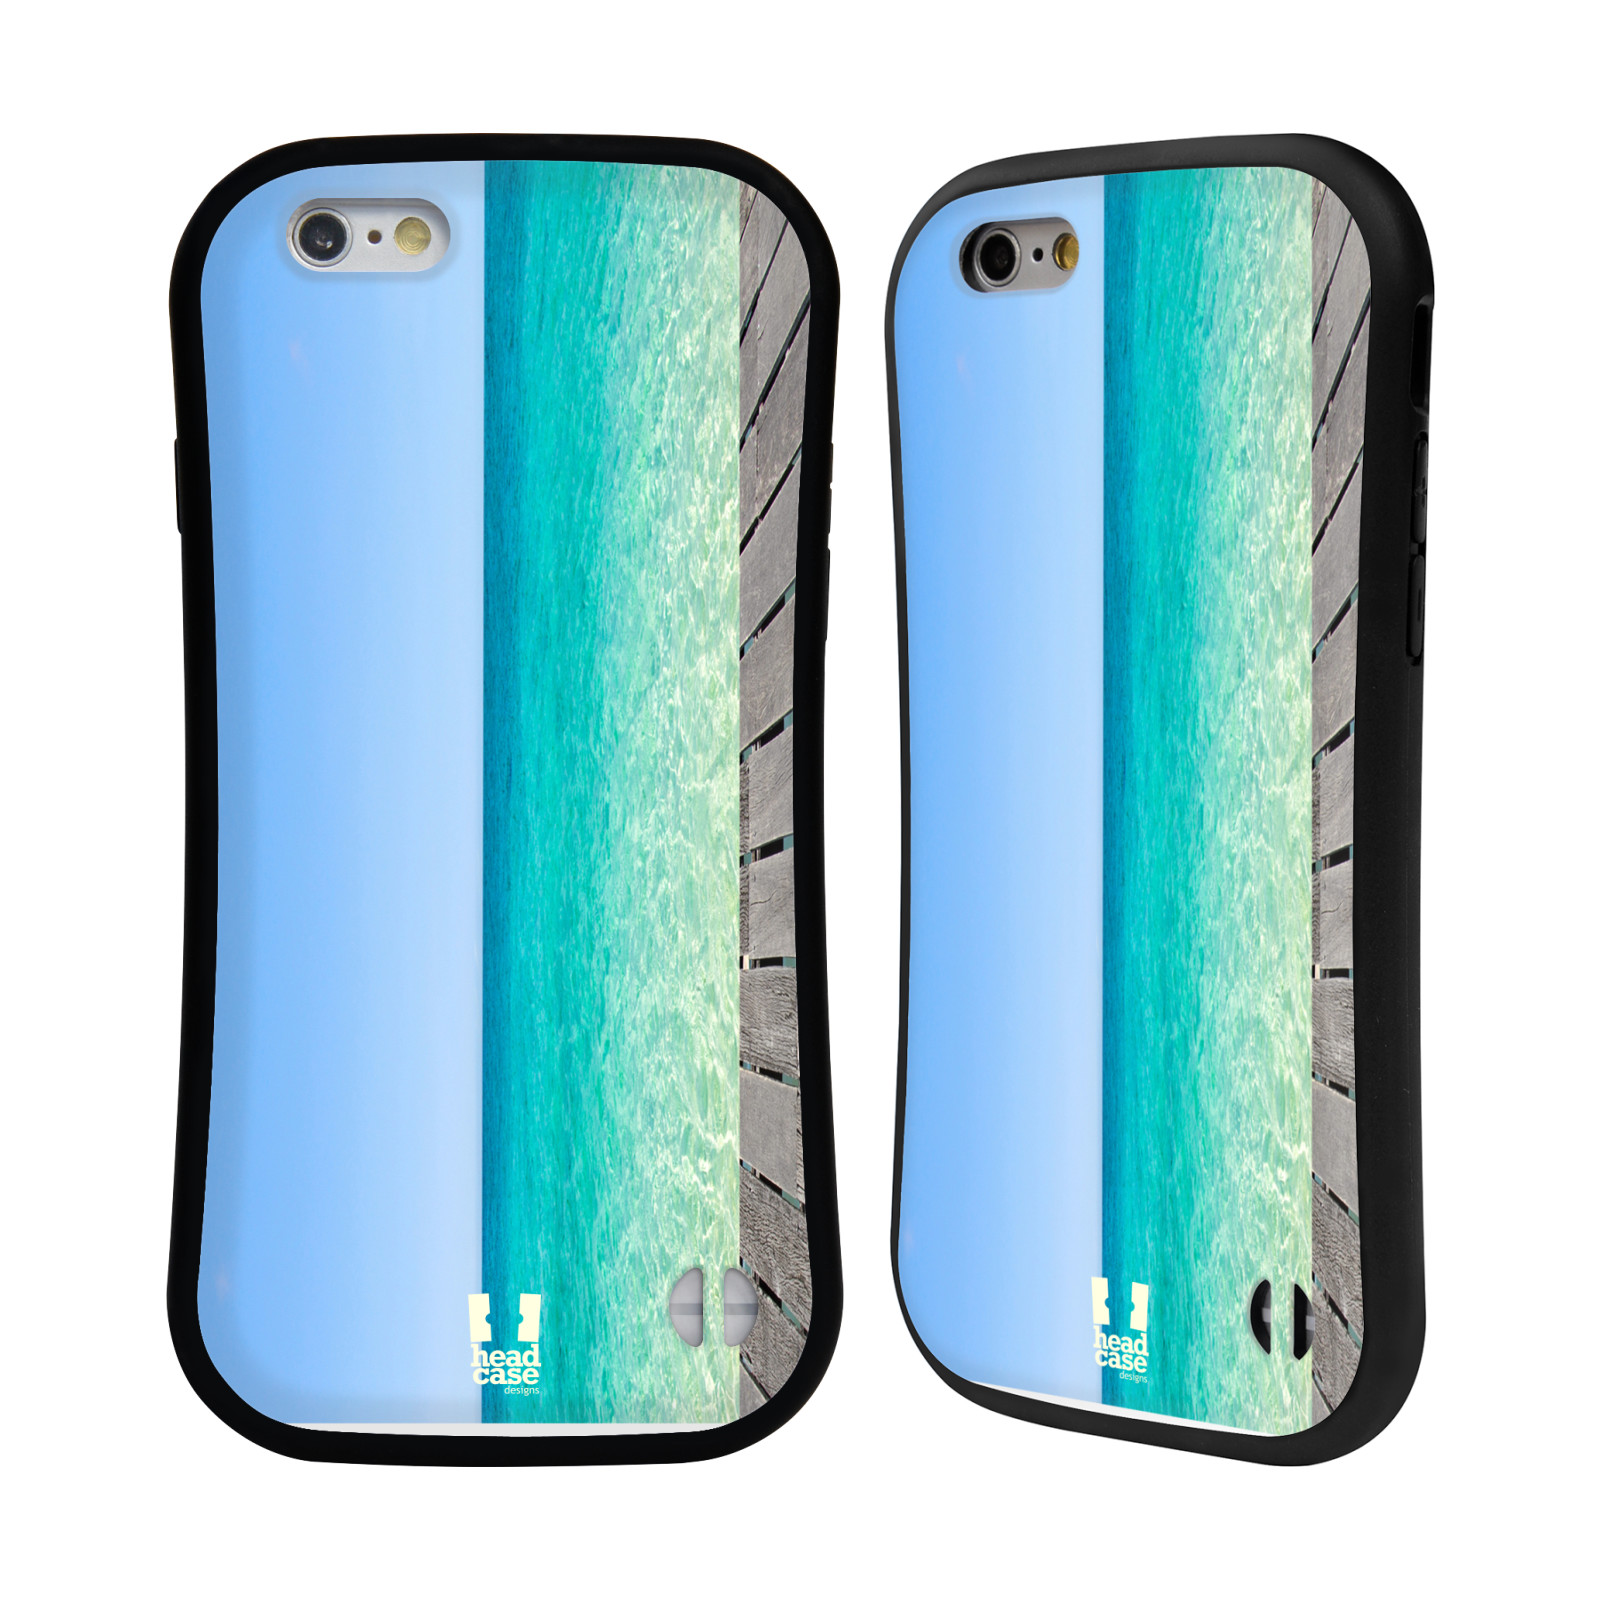 Head case designs beautiful beaches hybrid case for apple for Case design